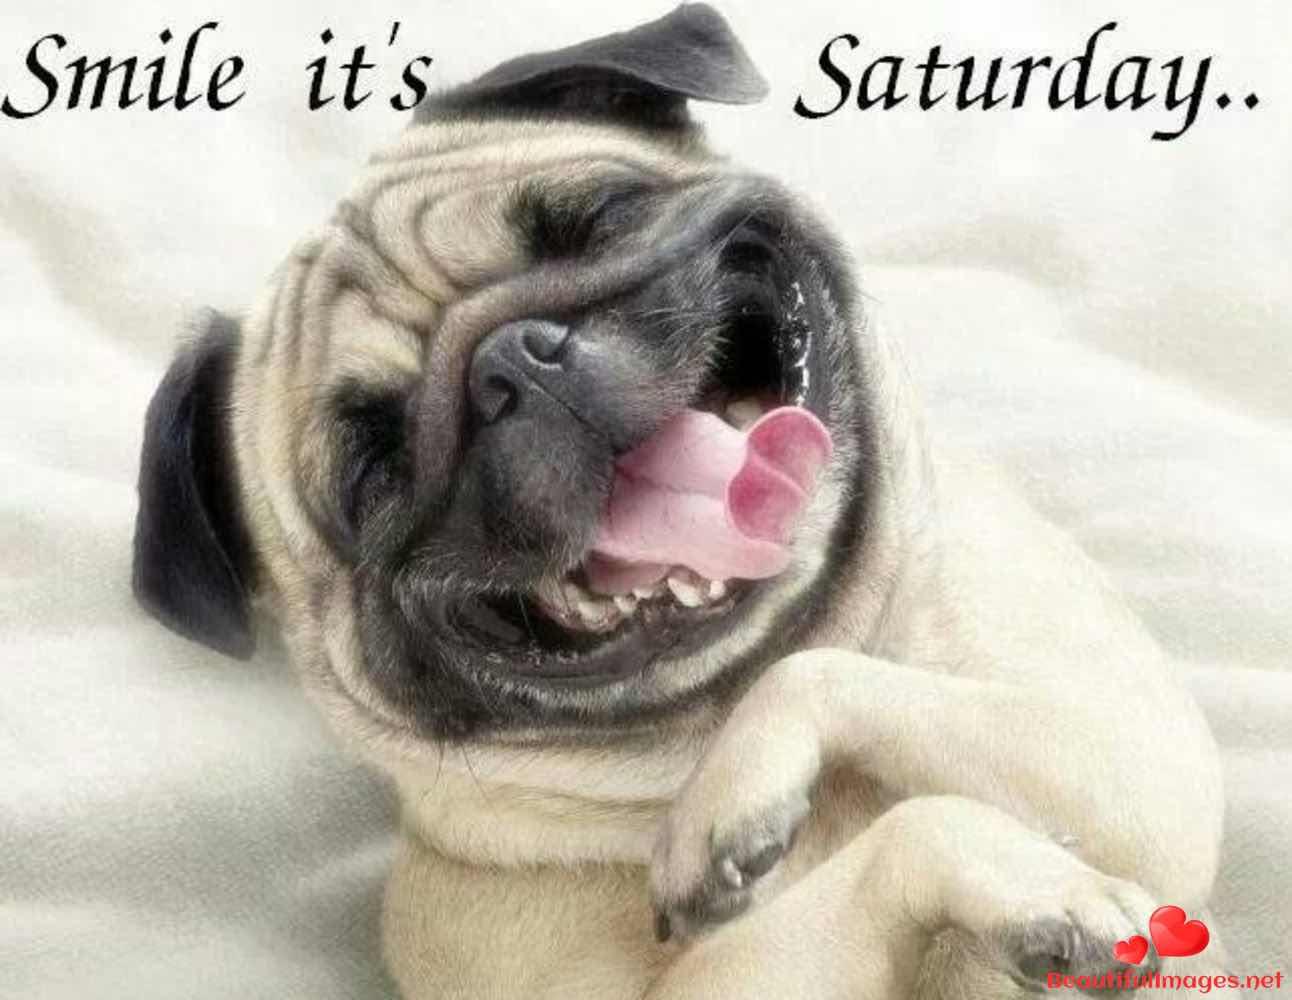 Good-morning-happy-saturday-facebook-whatsapp-images-nice-713